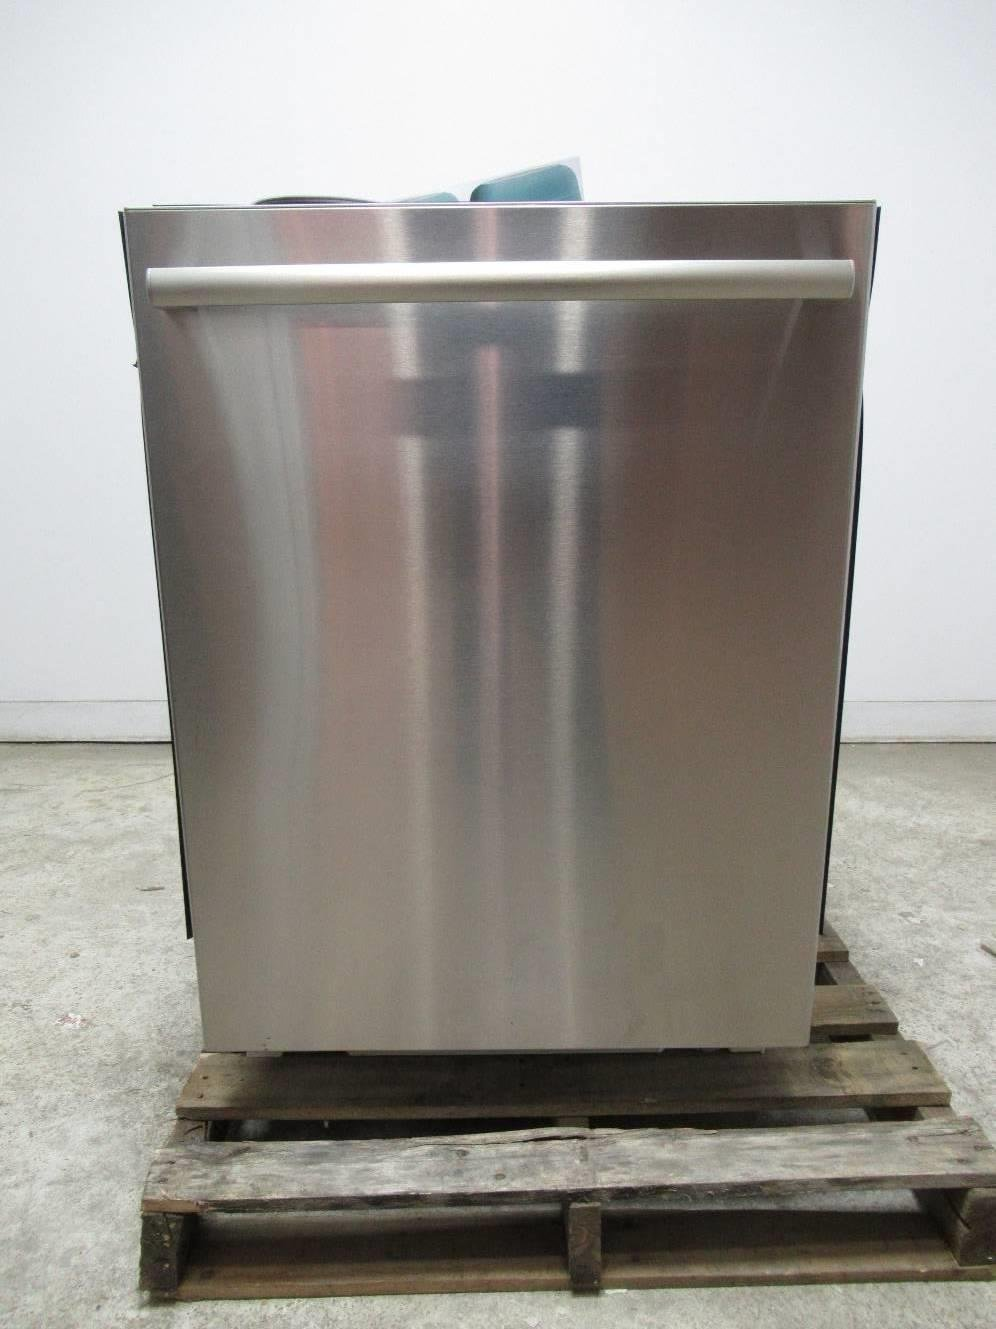 BOSCH Benchmark Series 24 40 dBA Fully Integrated Dishwasher SHX88PW55N